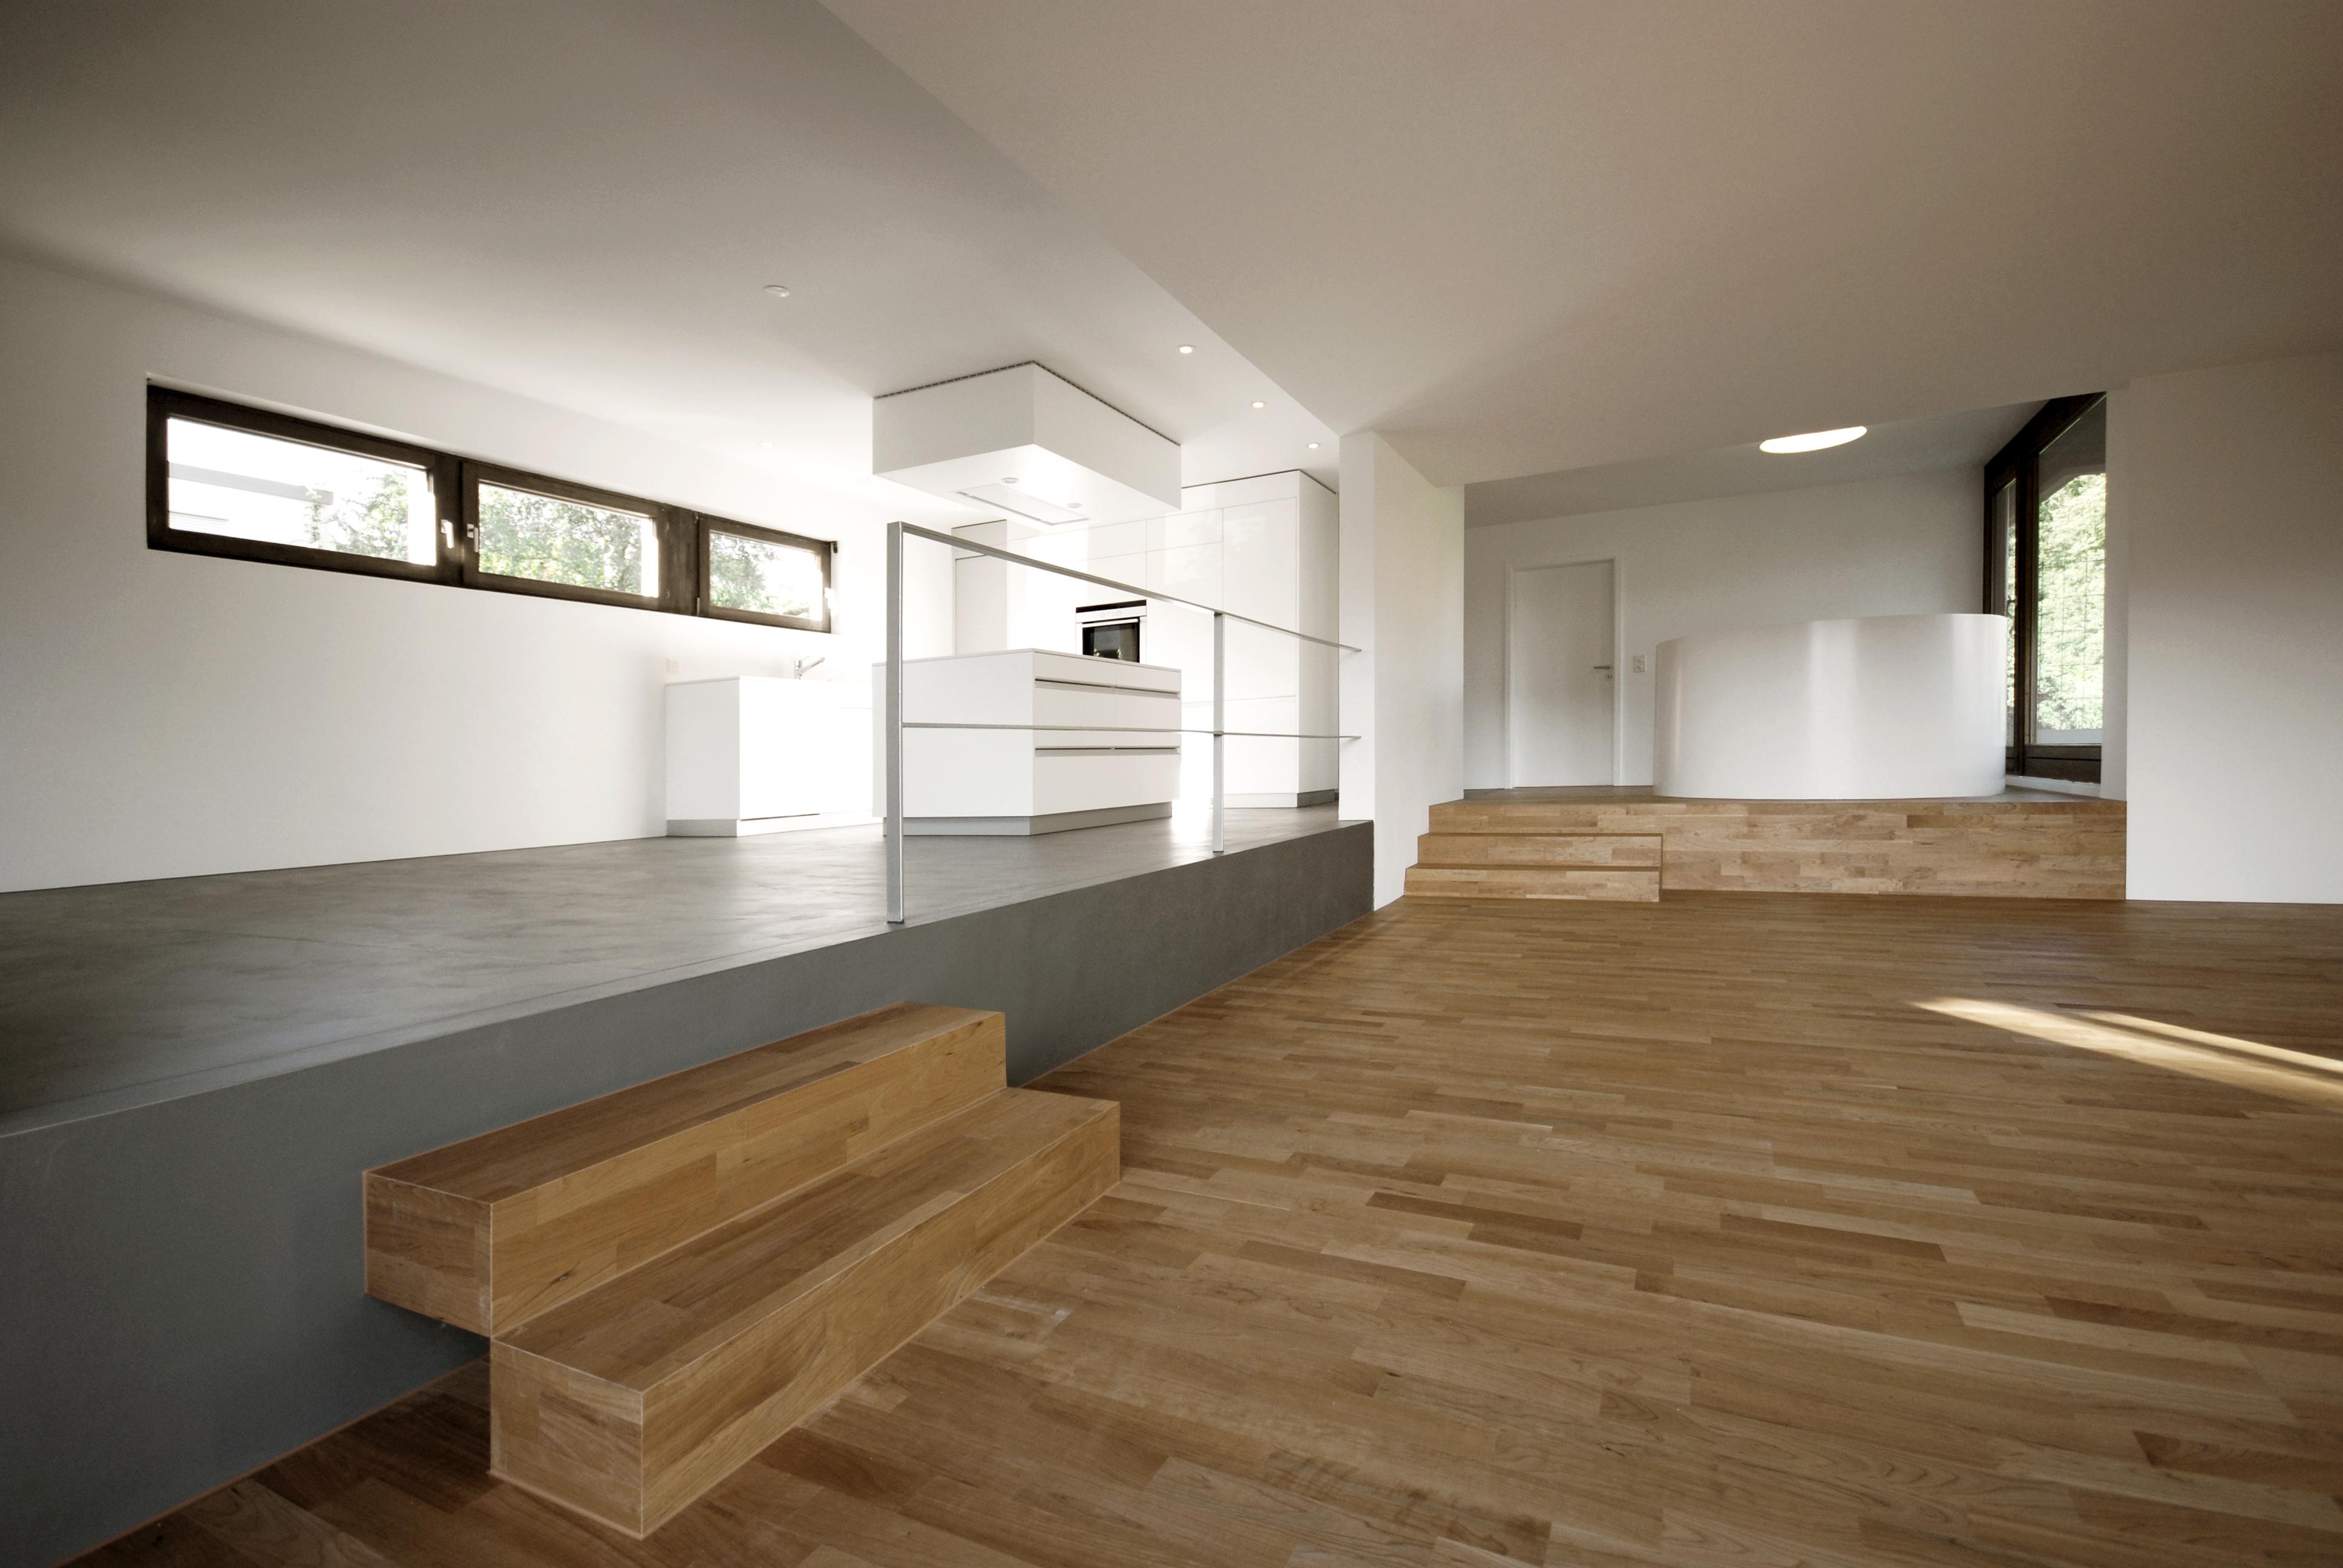 Wohnung lengnau innenarchitektur leitgedanke projekte for Innenarchitektur wohnung